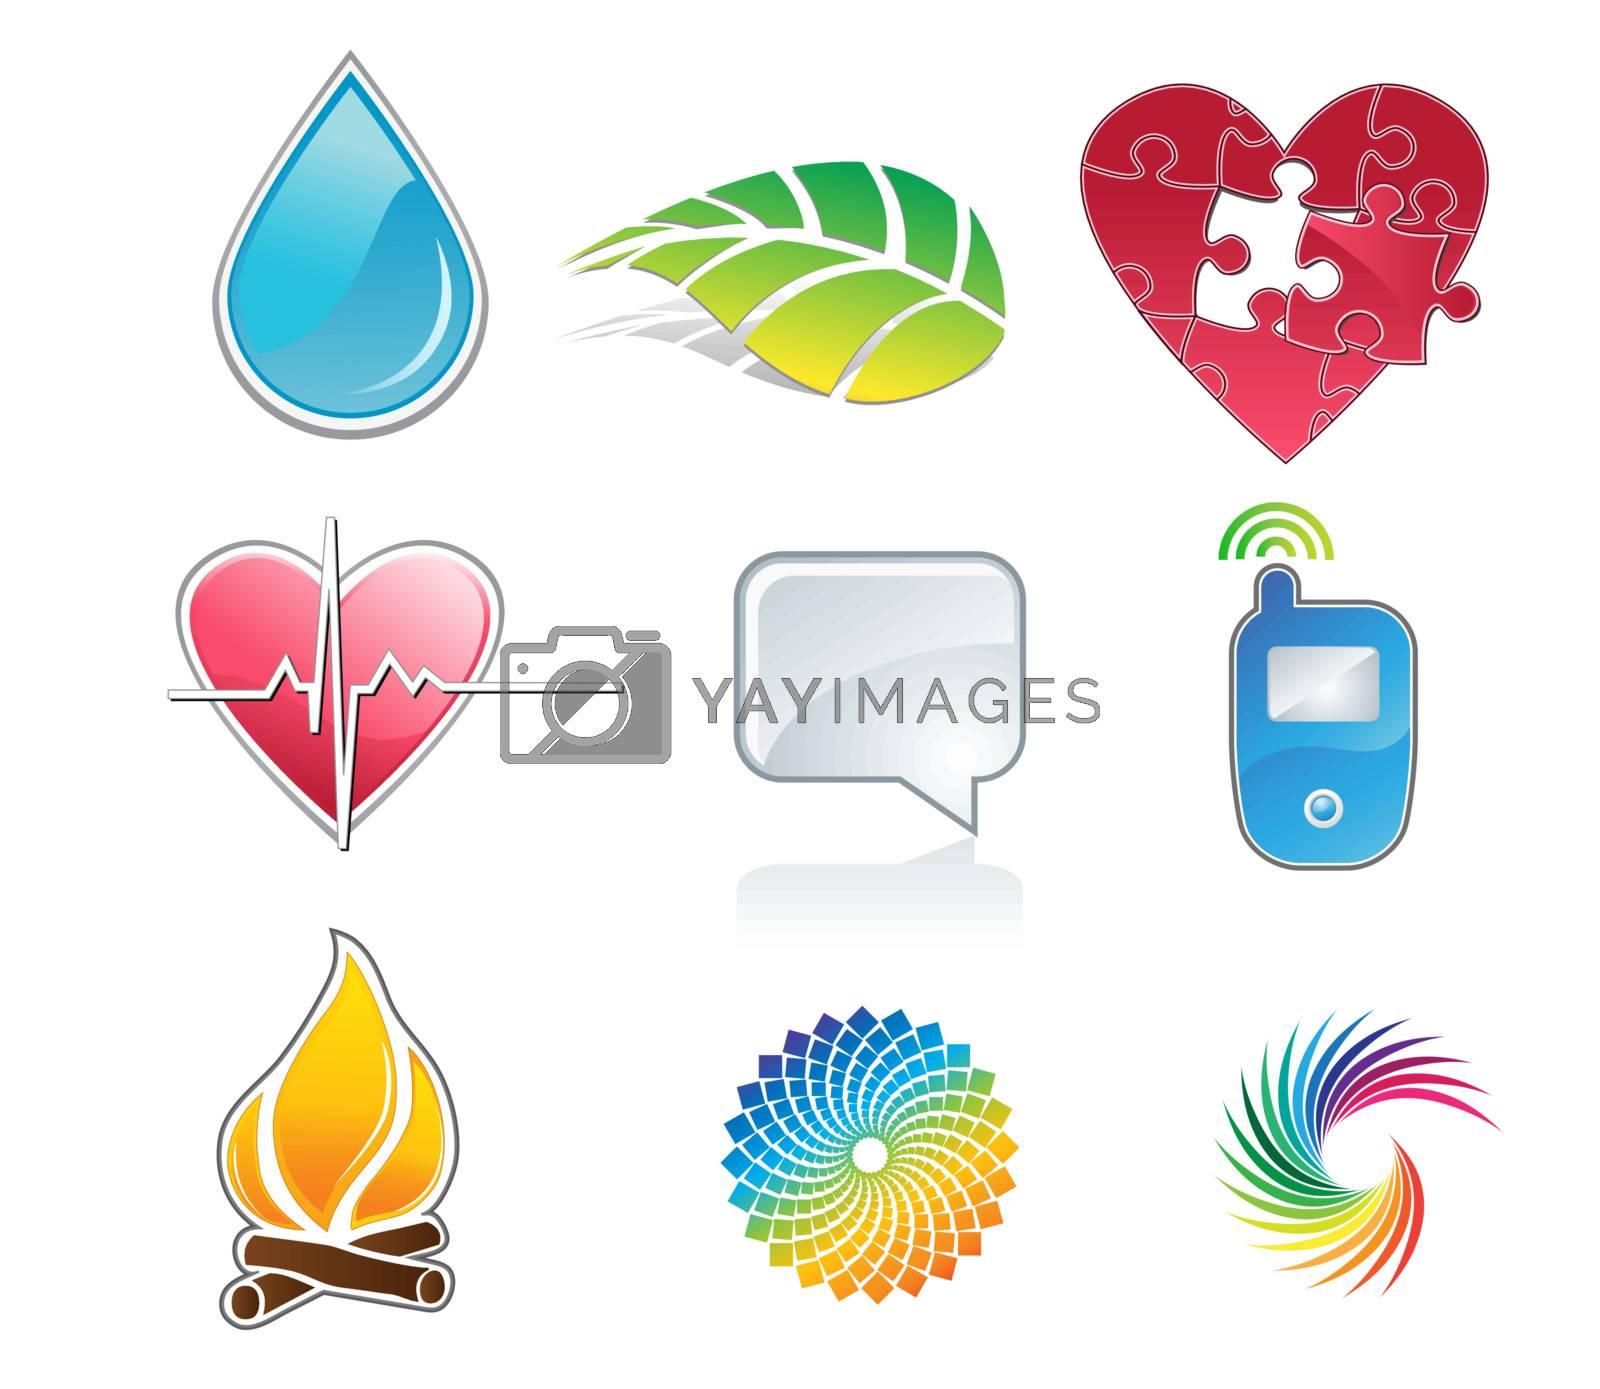 Royalty free image of Symbols vector by alladinian